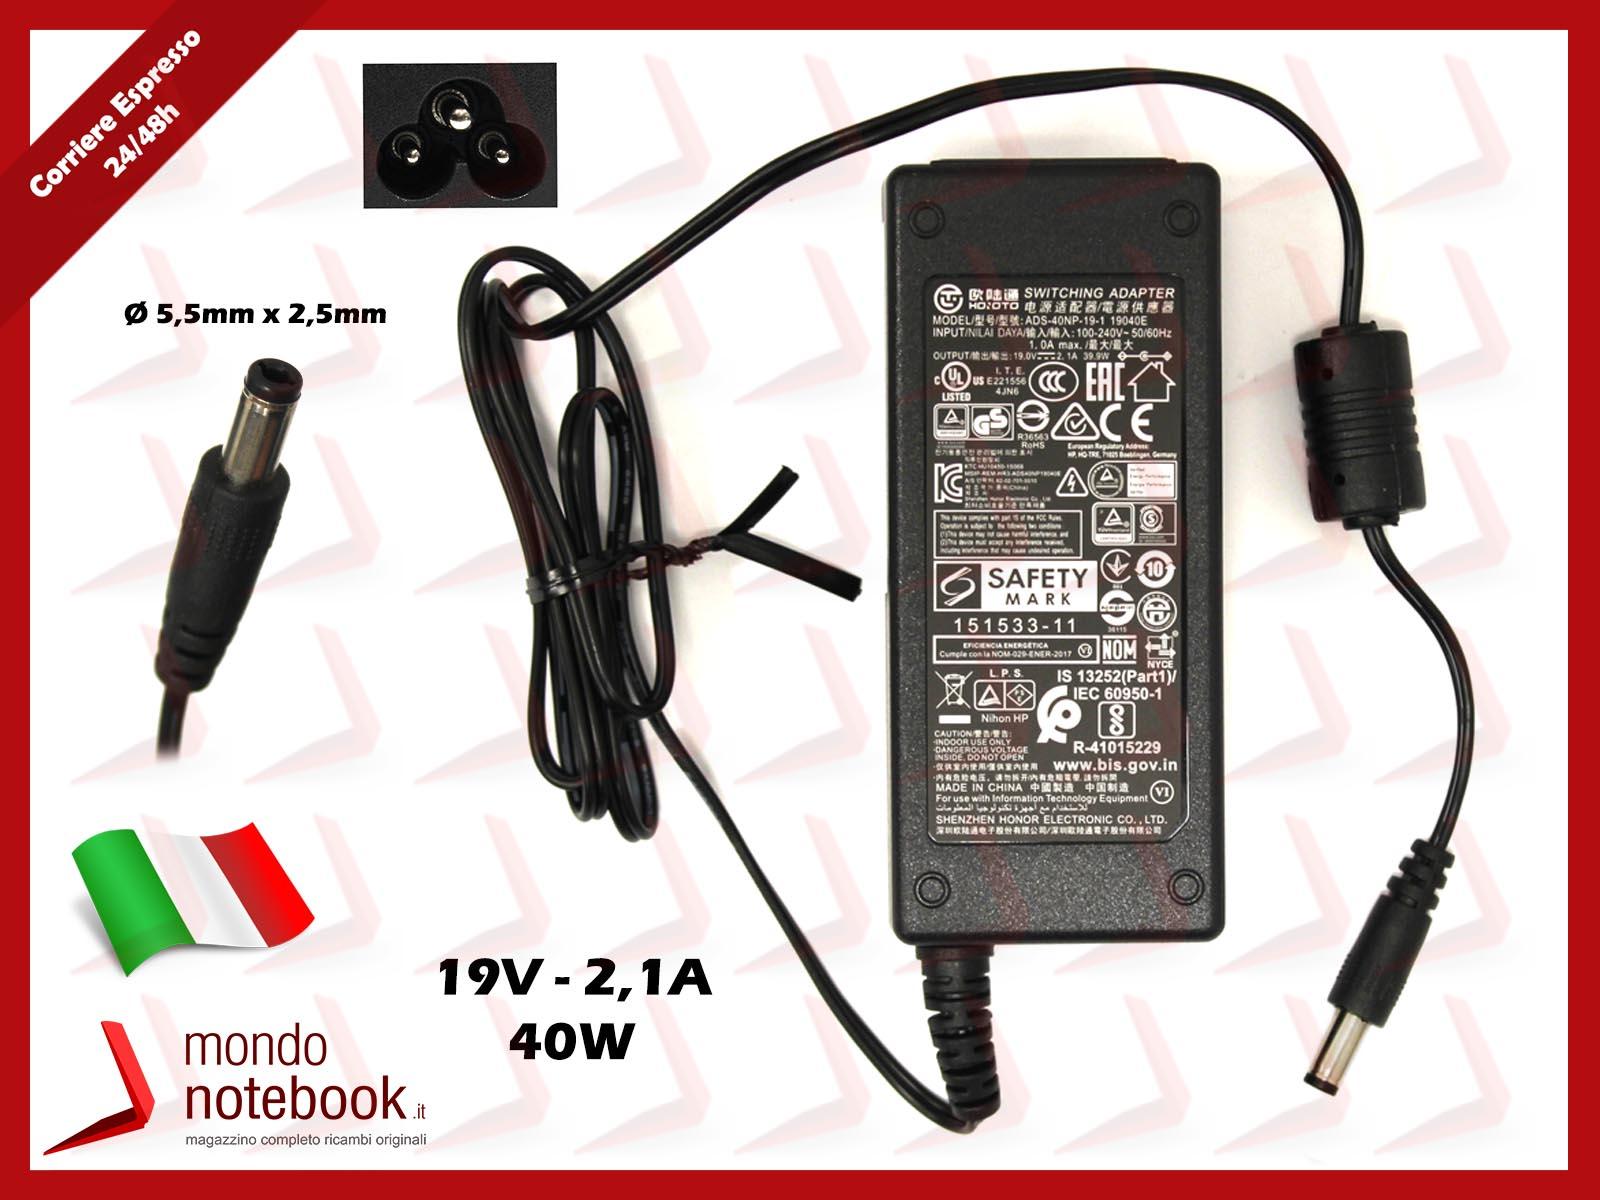 https://www.mondonotebook.it/3542/alimentatore-compatibile-per-hp-40w-19v-21a-55mm-x-25mm.jpg